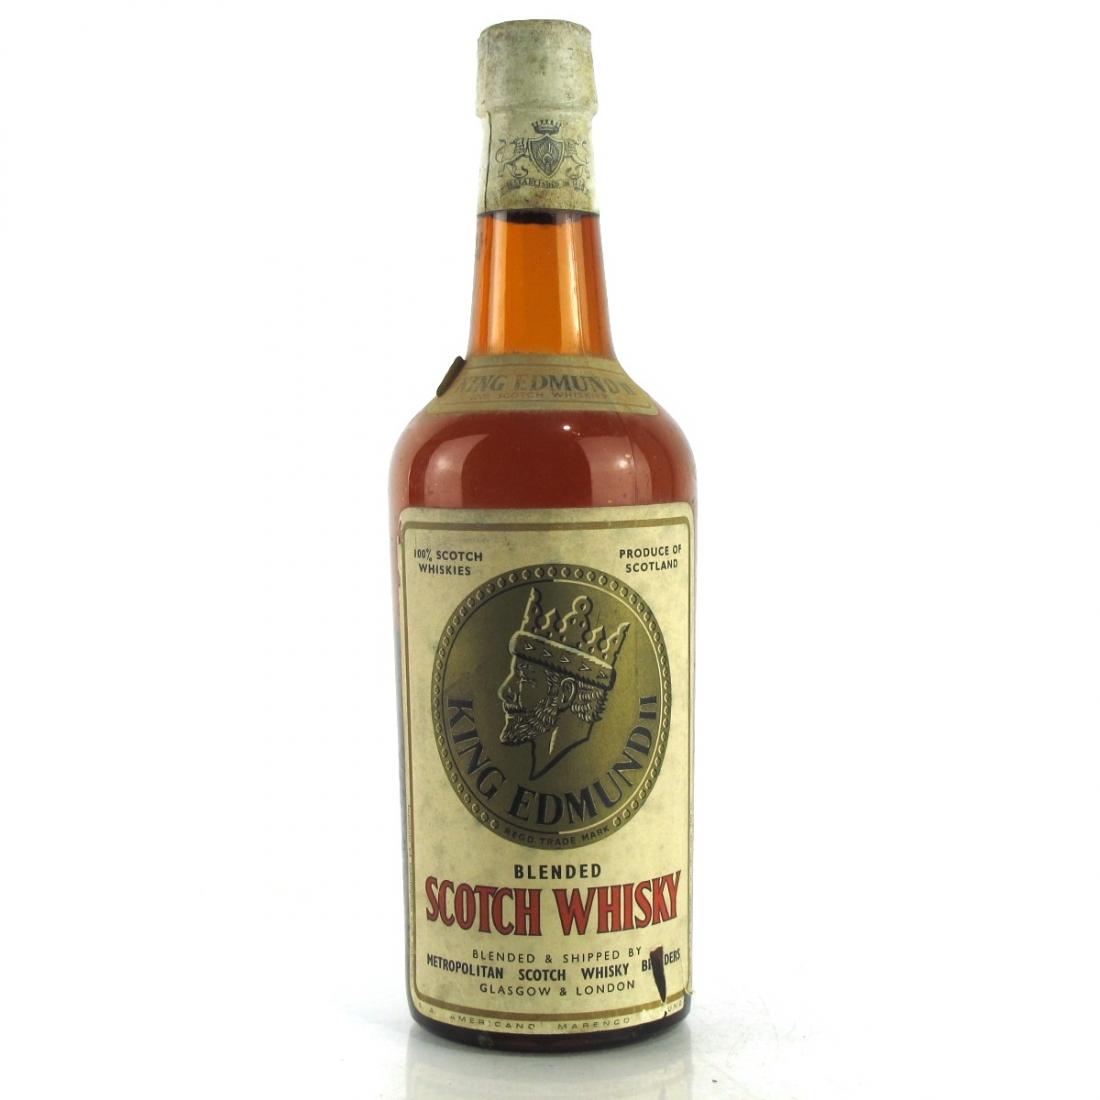 King Edmund II Scotch Whisky 1960s